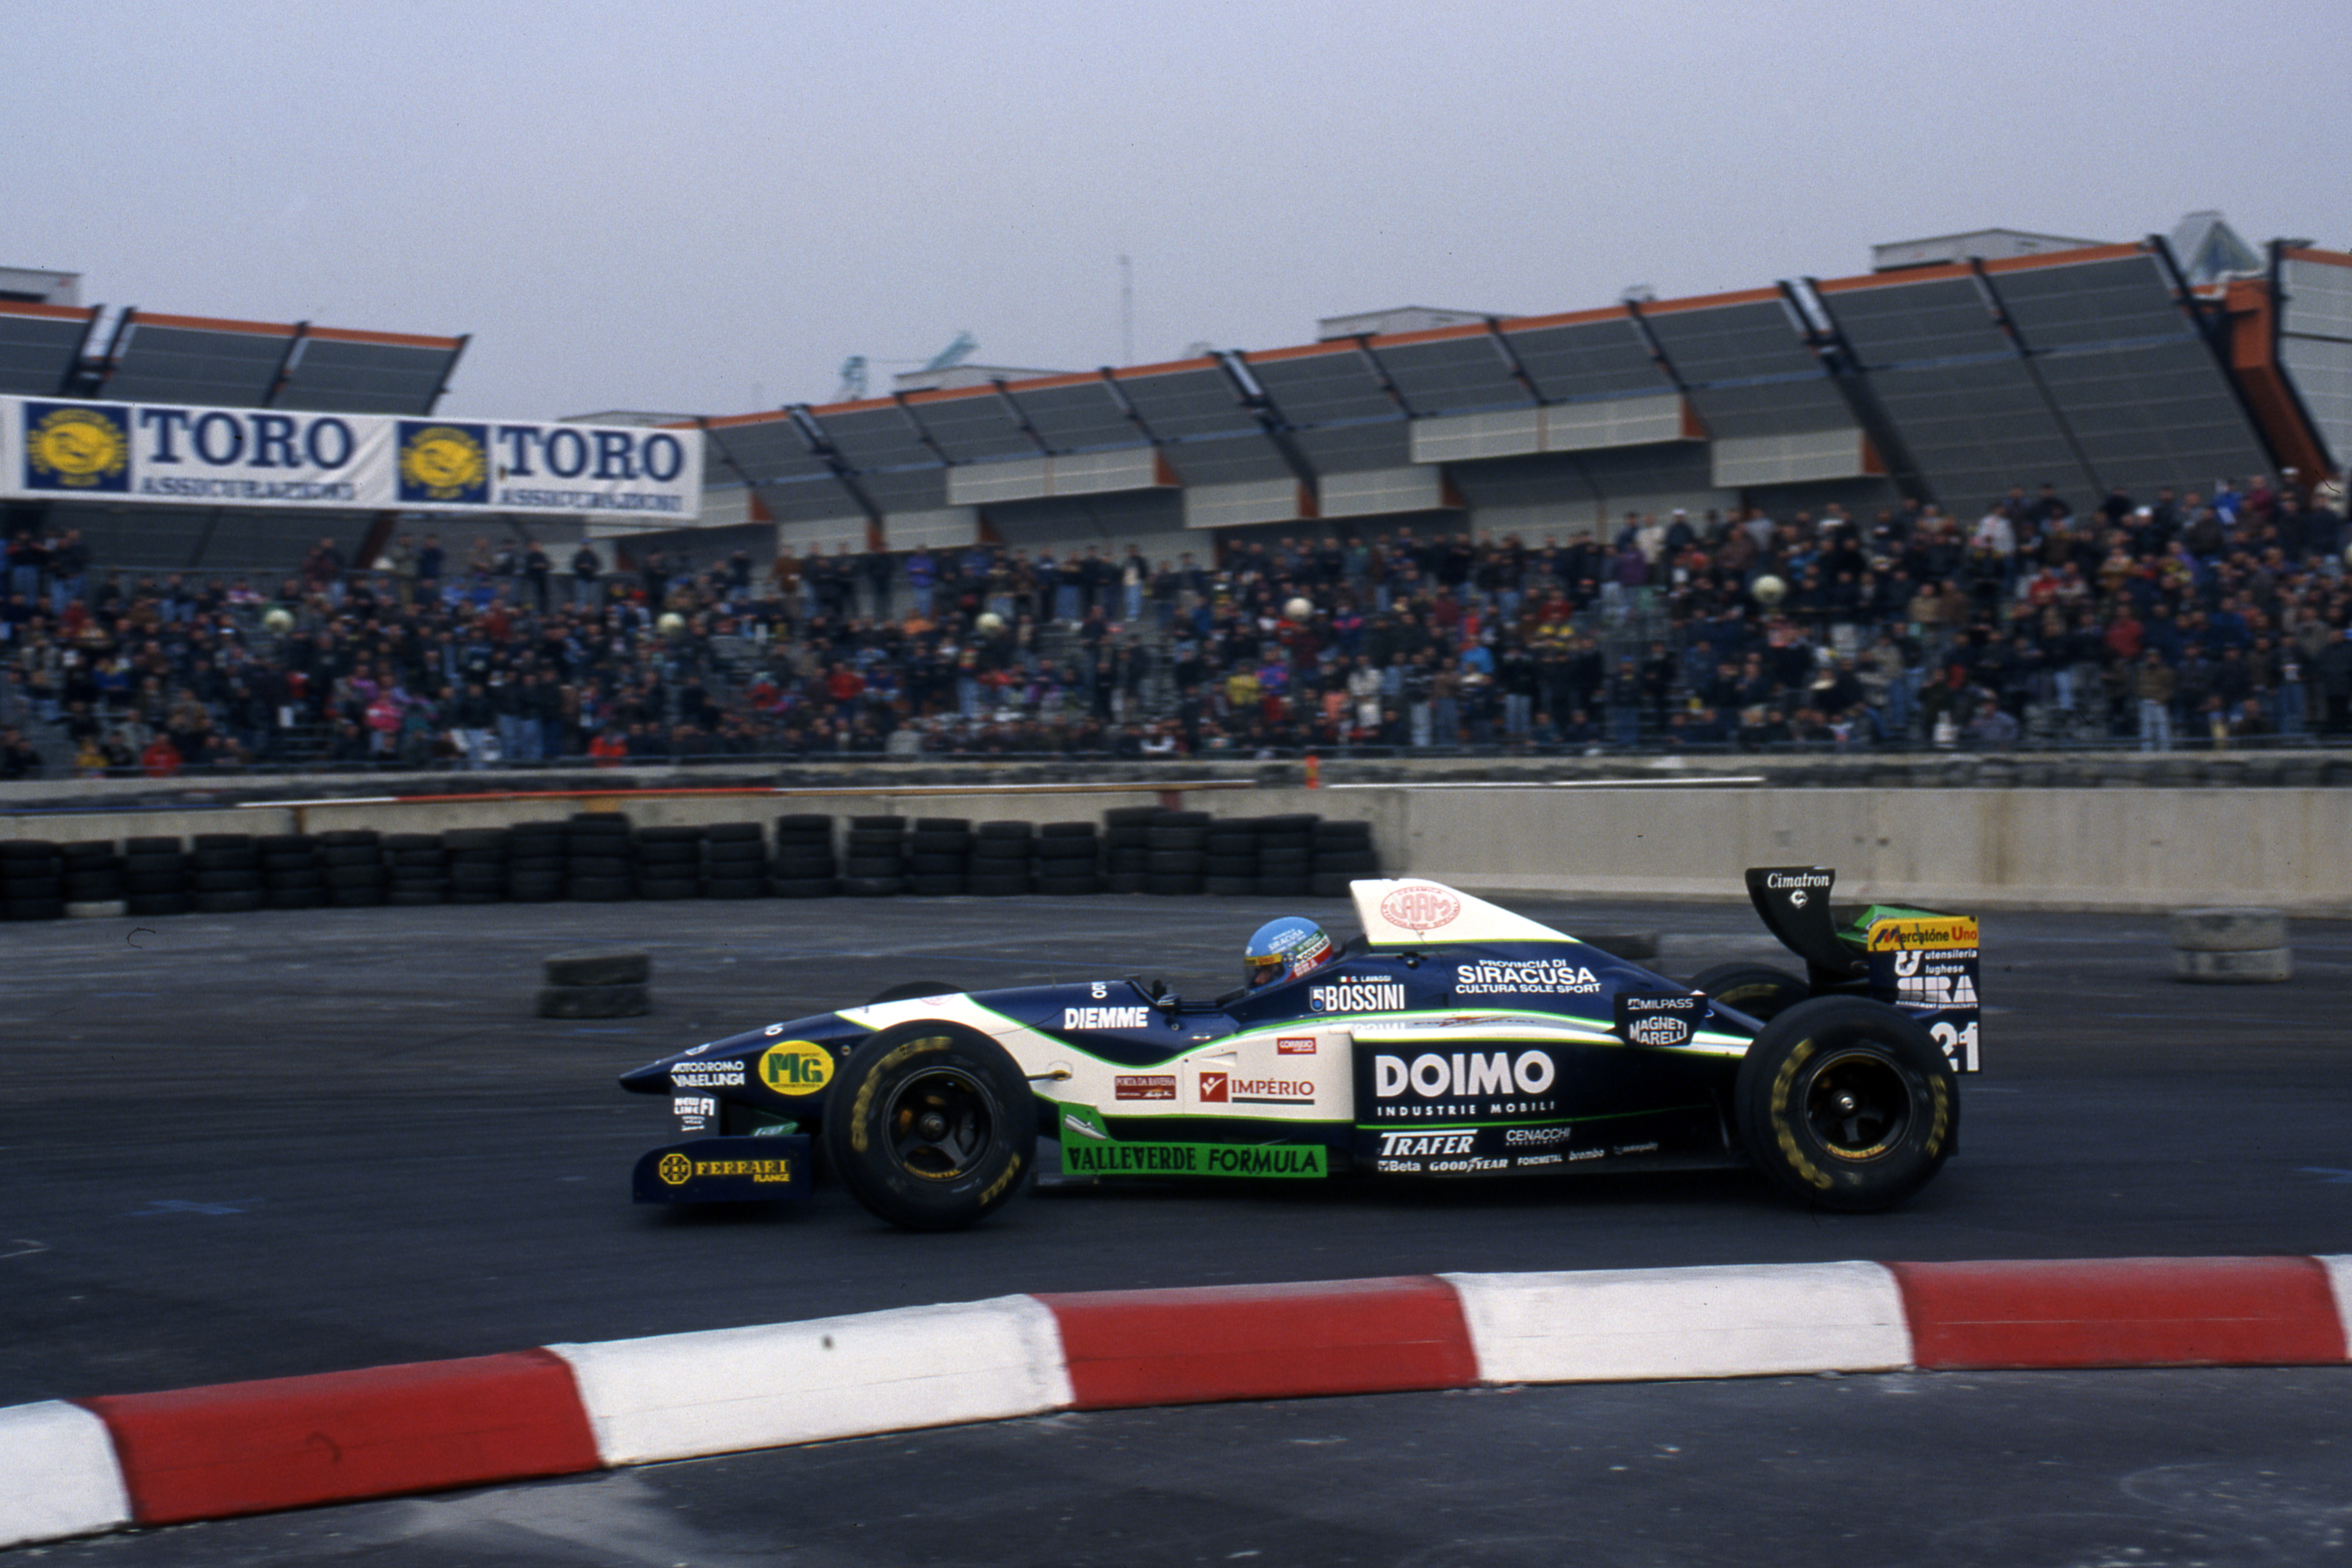 Motor Show Formula One Indoor Trophy Bologna (ita) 07 08 12 1996